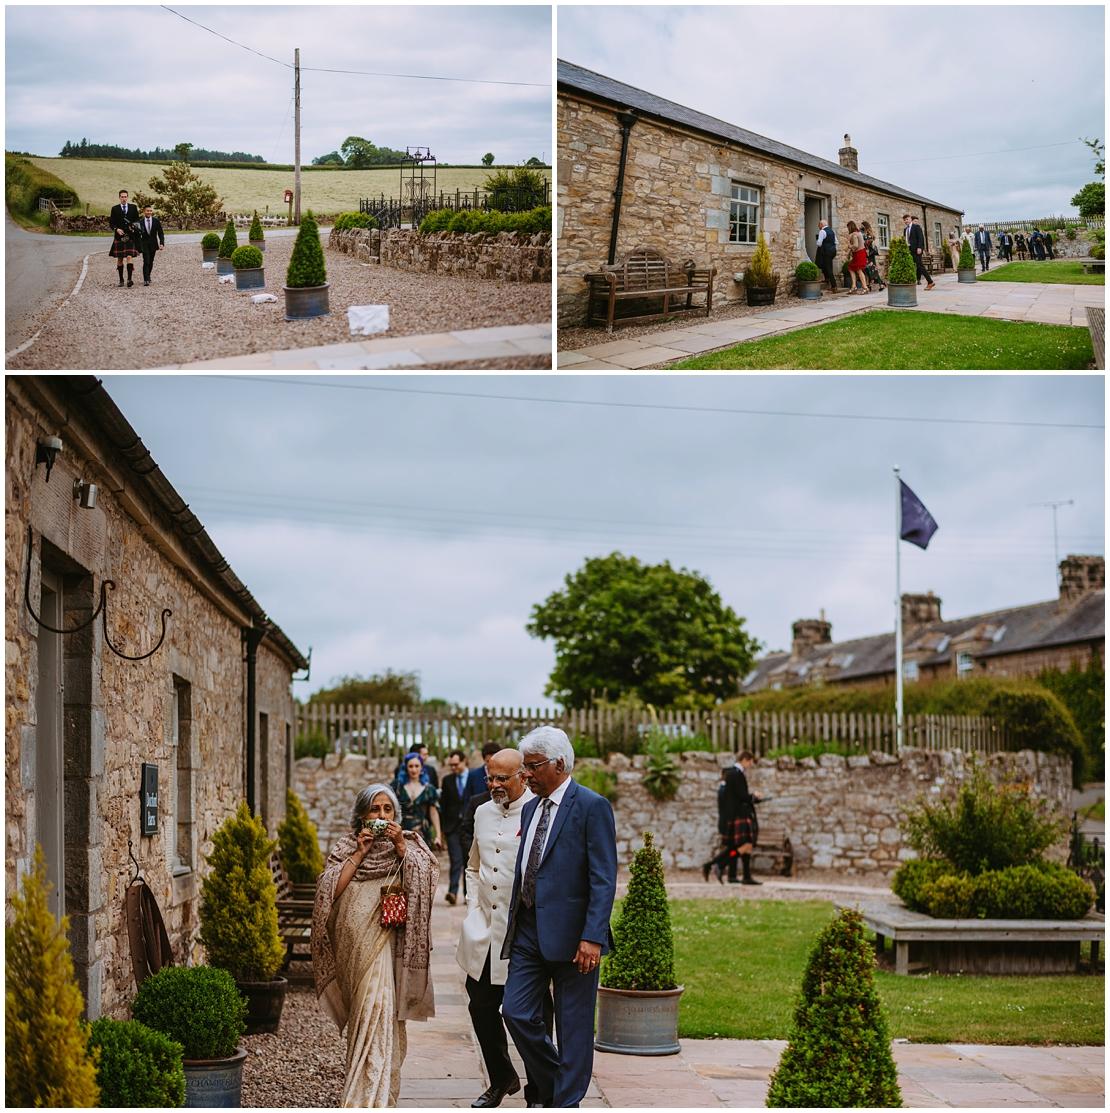 doxford barns wedding photography katie vivek 0005